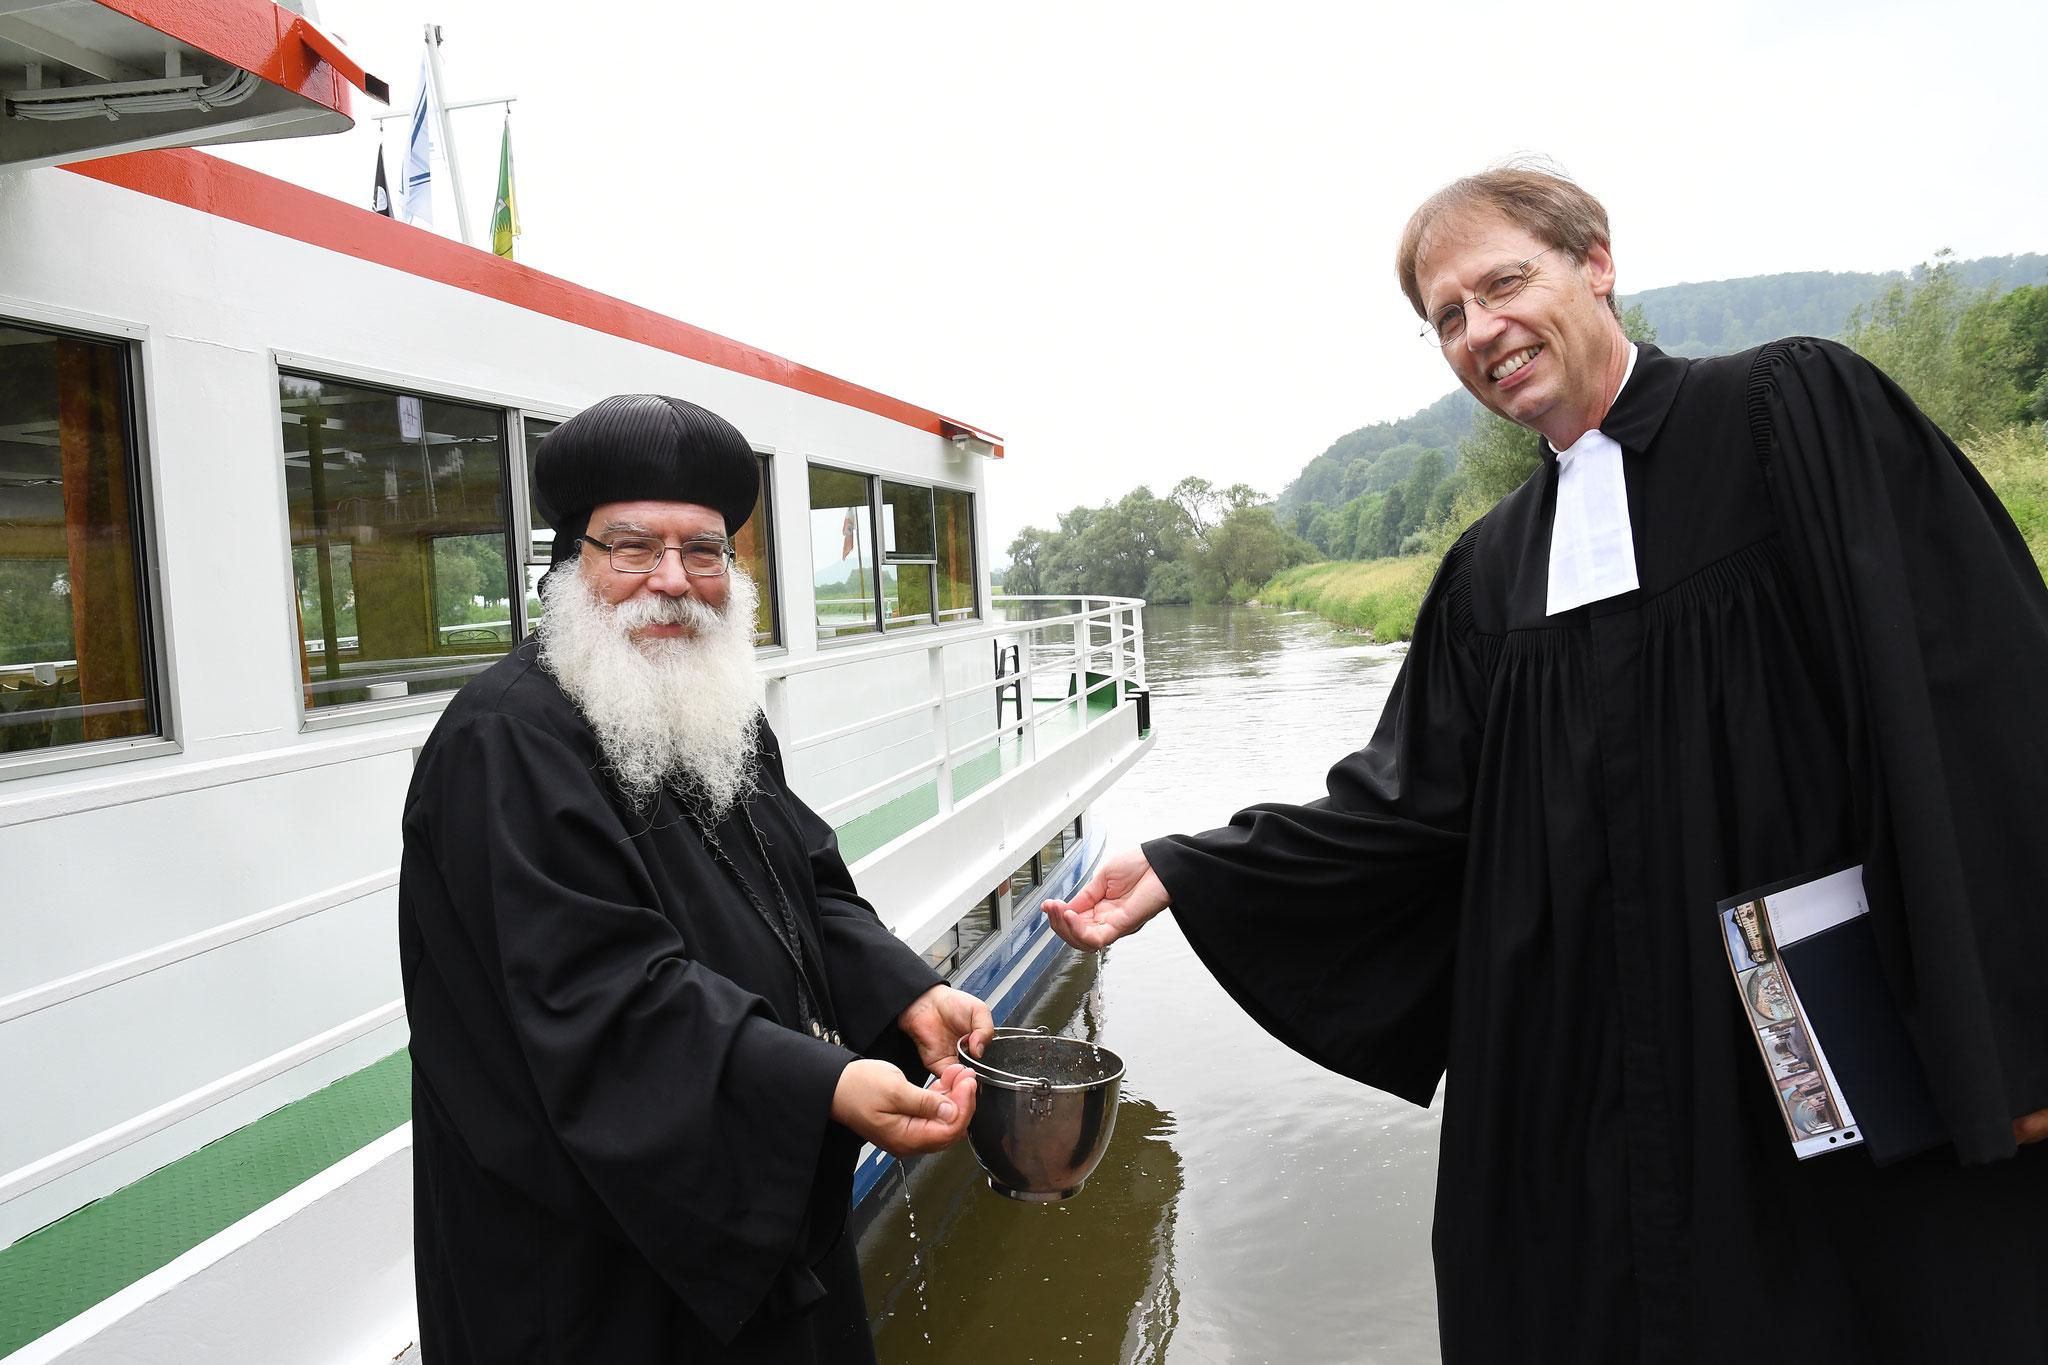 S.E. Bischof Anba Damian und Oberkirchenrat Dr. Ulrich Möller bei der Segnung der Weser. Foto: Maria Hopp